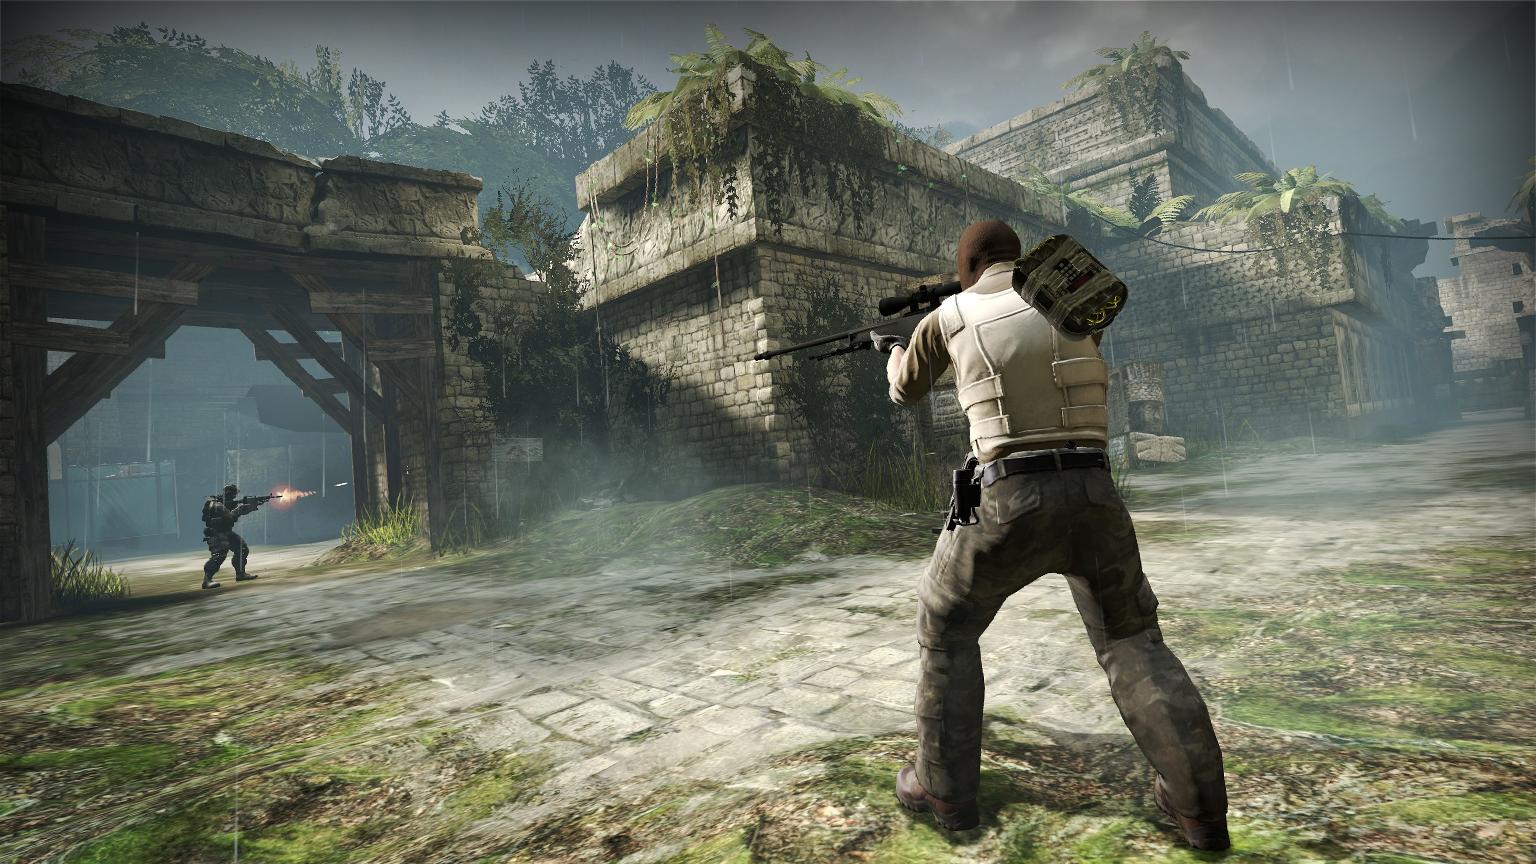 Counter Strike Cs Go Wallpaper Hd Cs Go Cinematic 59558